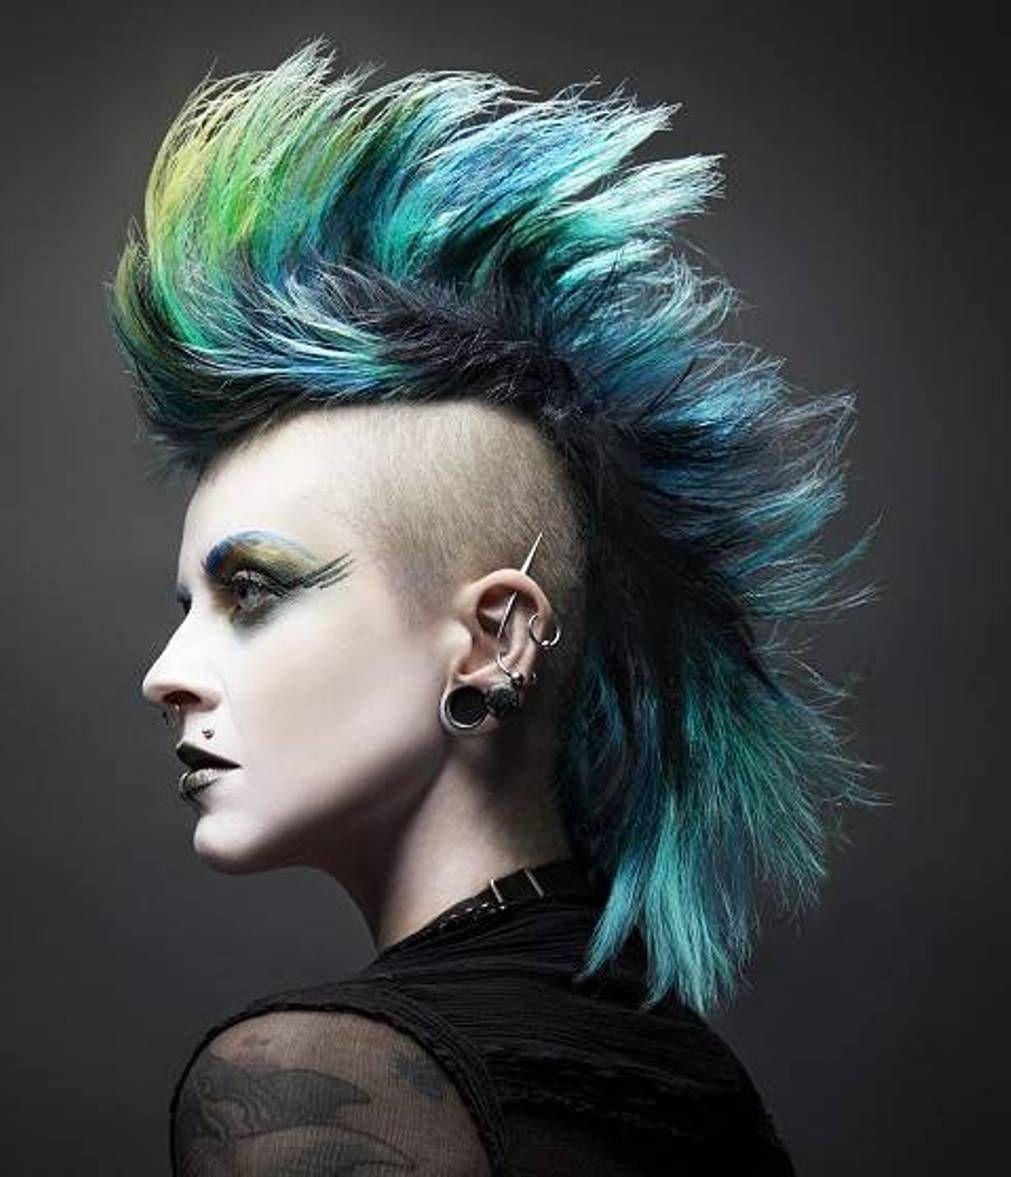 Hairstyle Neo Pop Punk Hairstyles Punk Haircut Goth Hair Rock Hairstyles